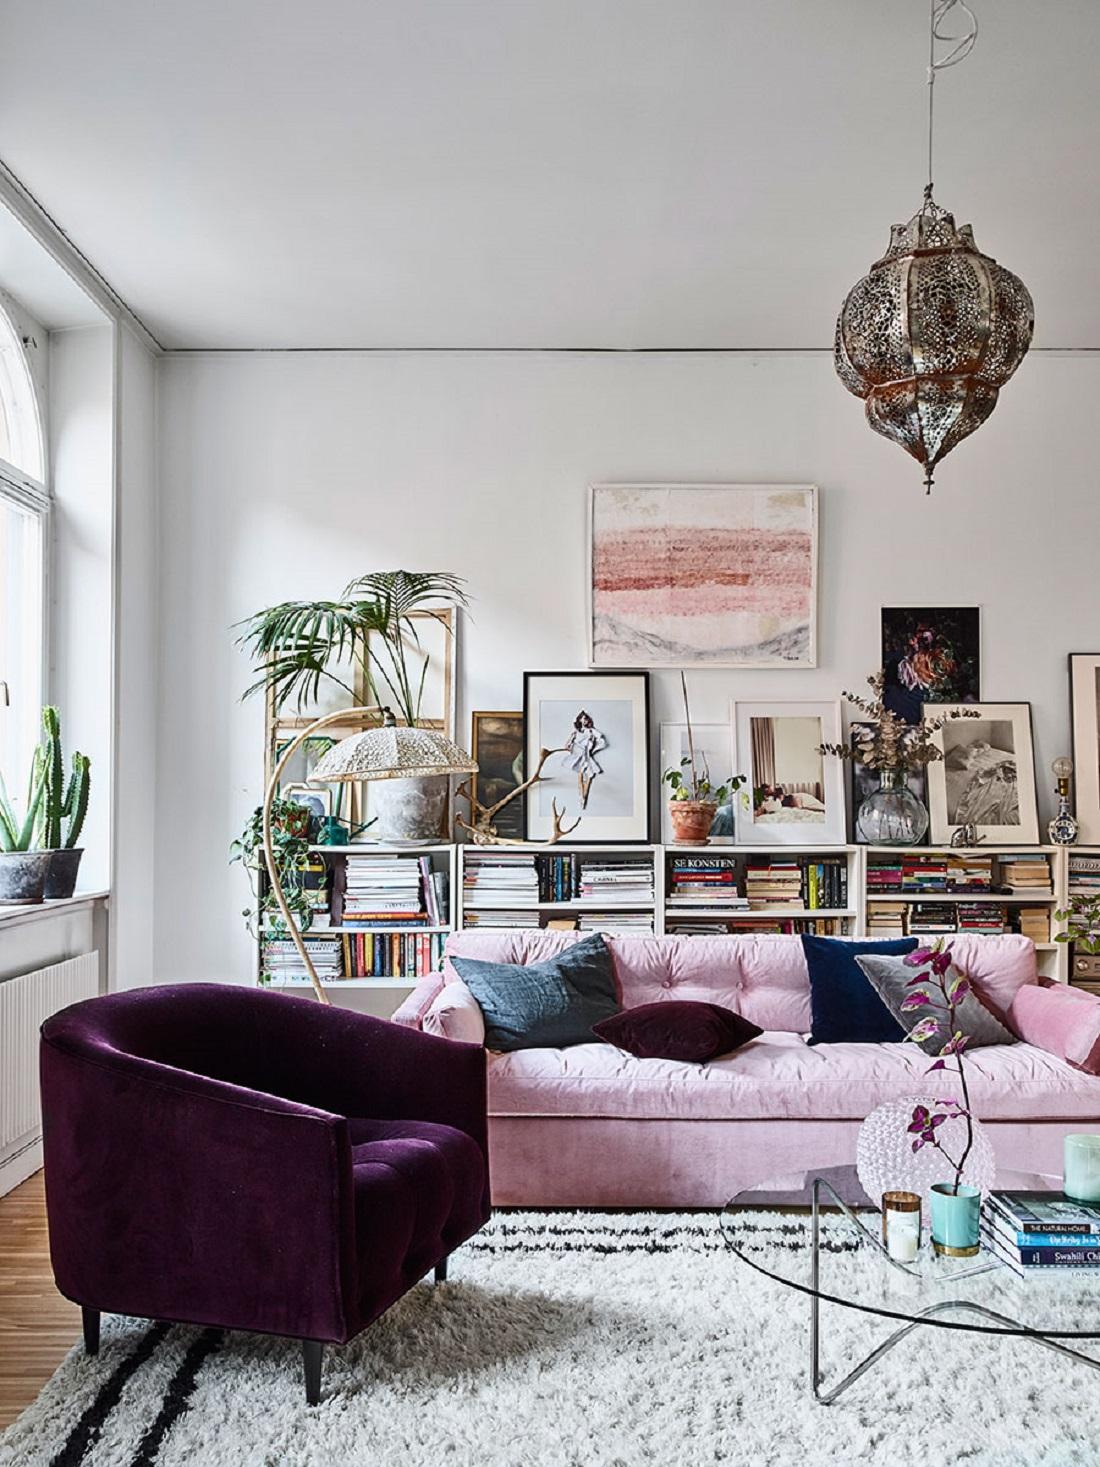 @projectfairytale: Pretty Scandinavian Interior